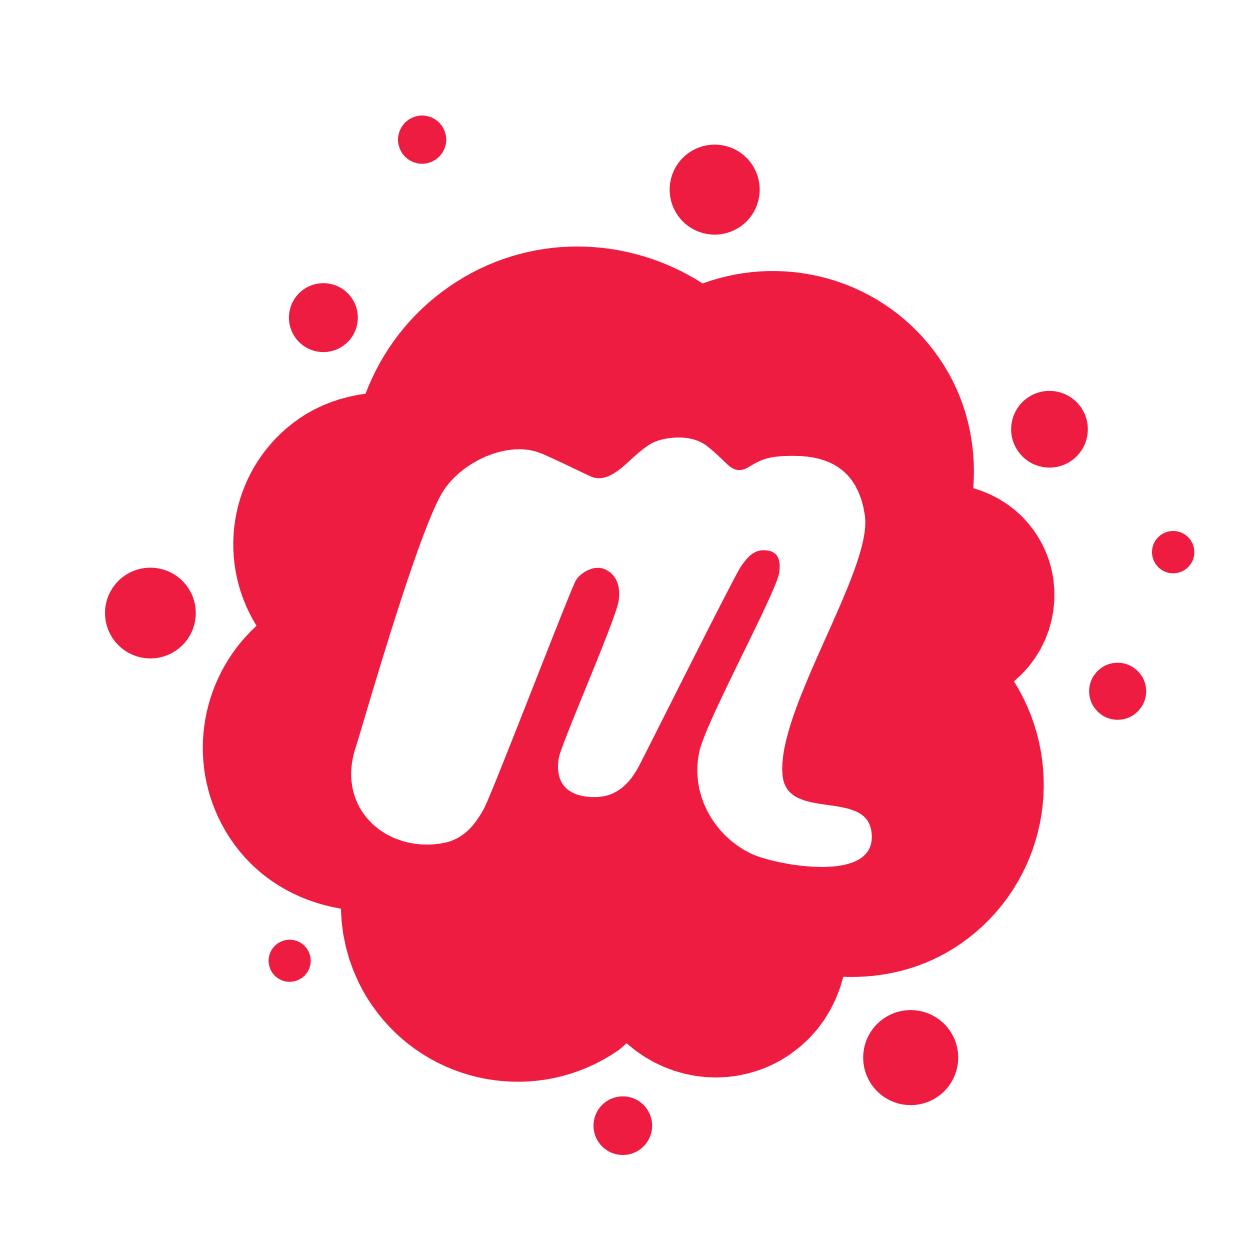 Parlons peu…Parlons Cloud ! - Thursday 21 september 2017 | Blog KissLabs